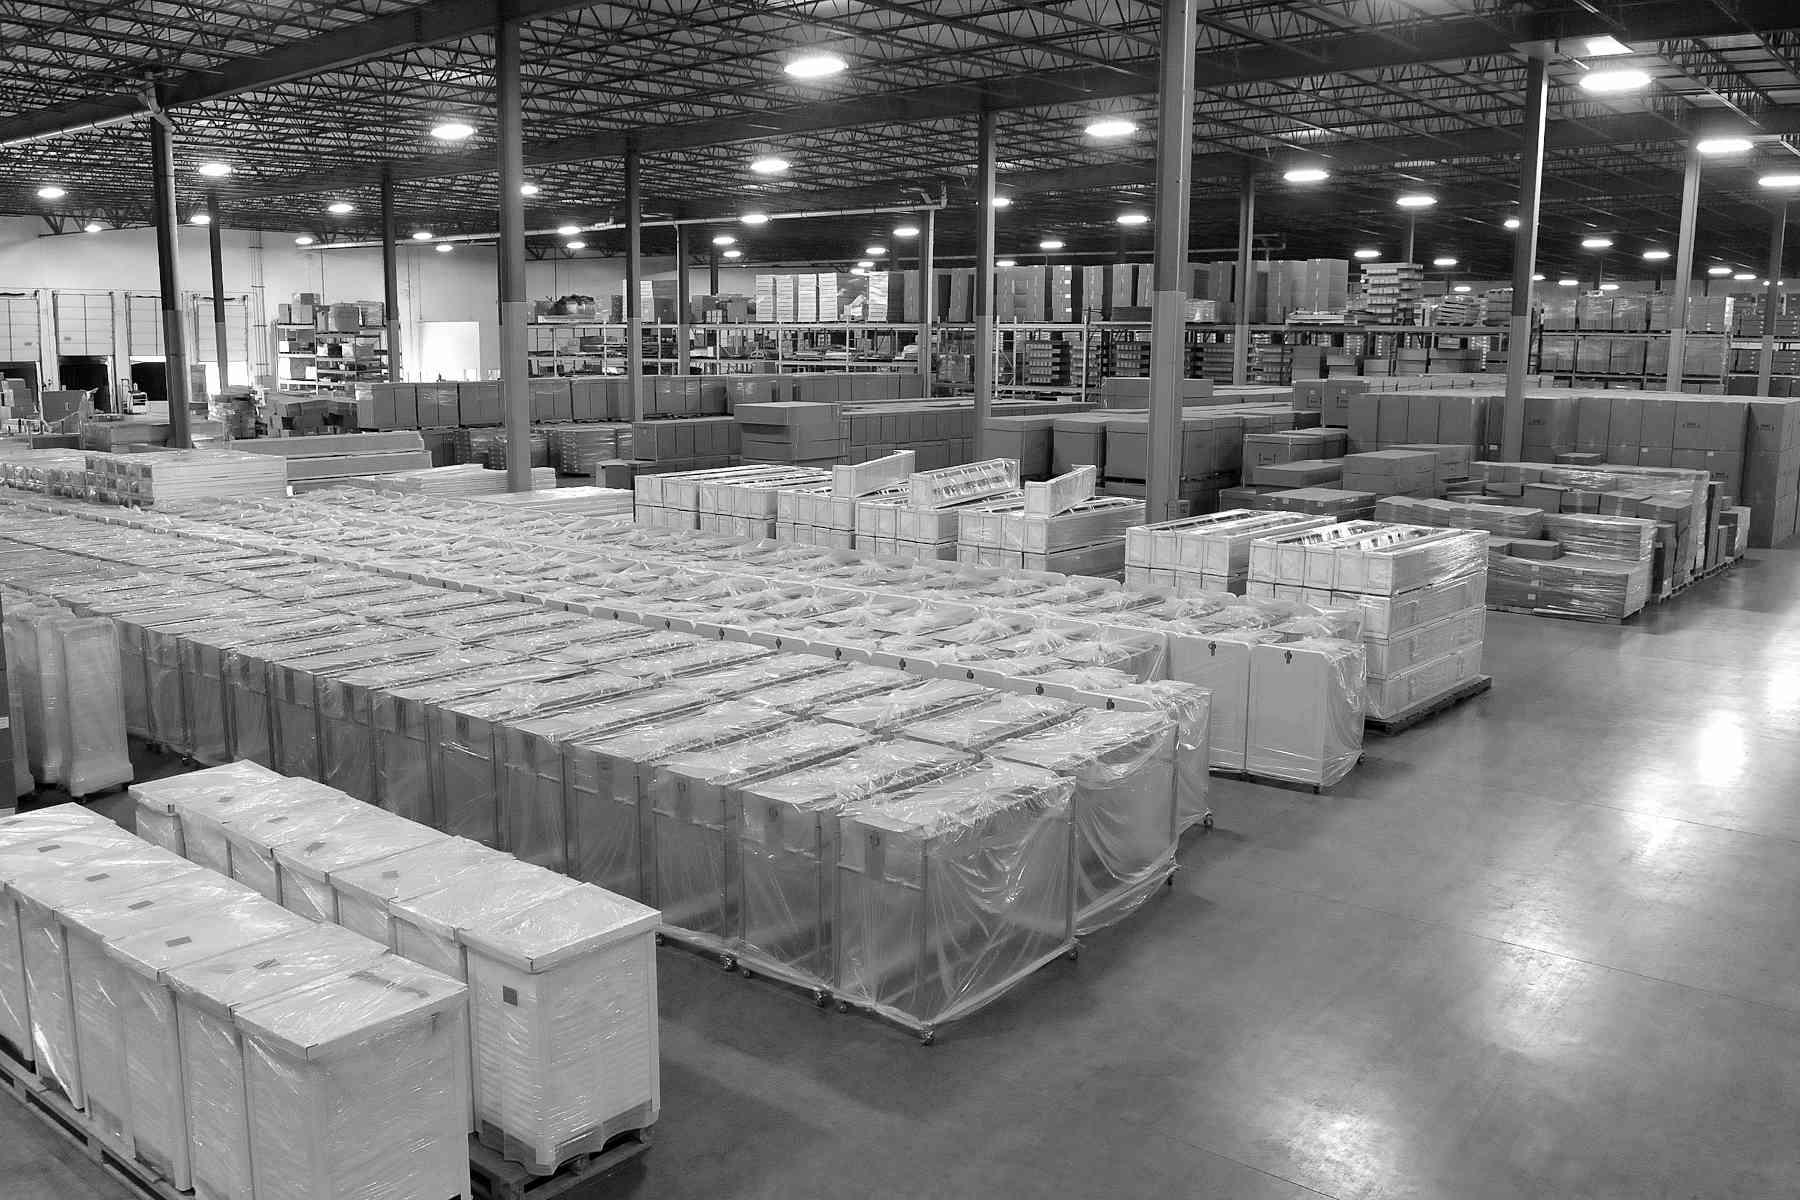 https://mw-sf.com/wp-content/uploads/2019/11/inventory-management-02.jpg